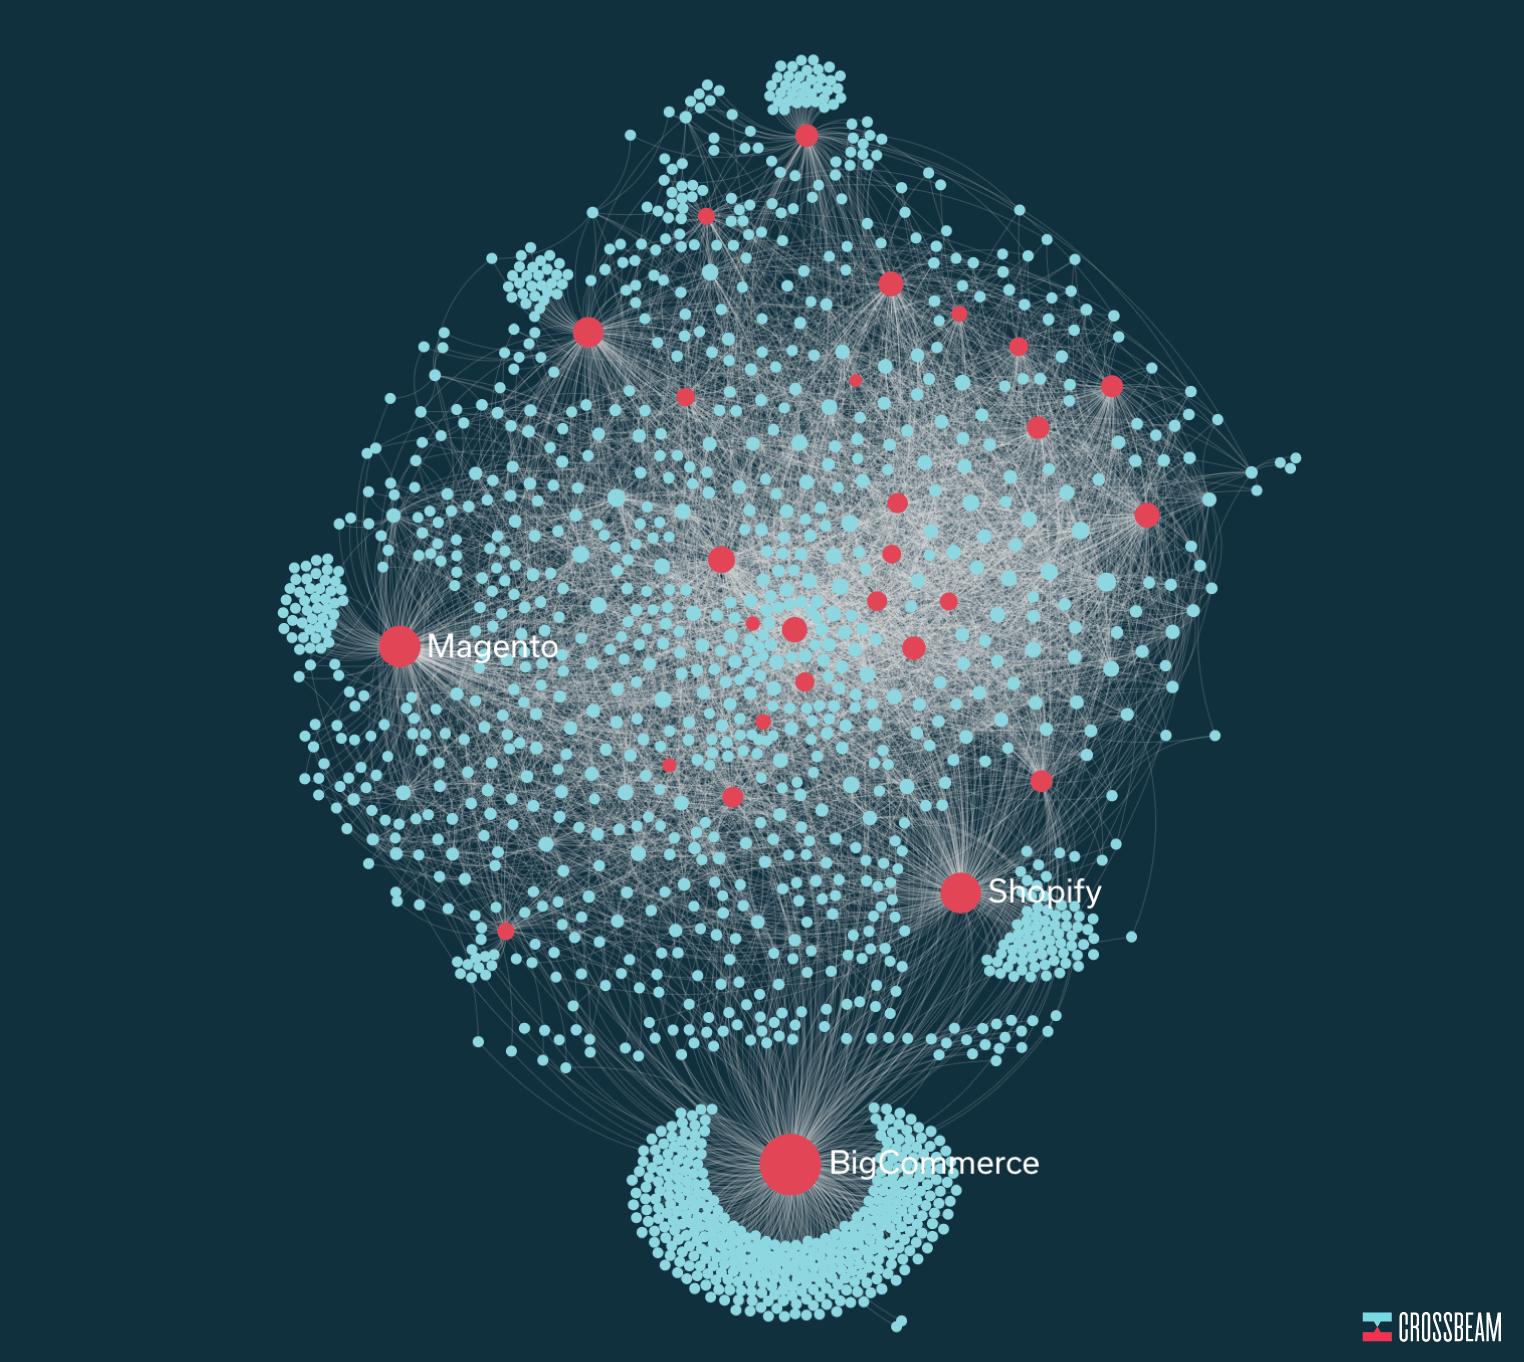 crossbeam-mapping-ecommerce-partner-ecosystem